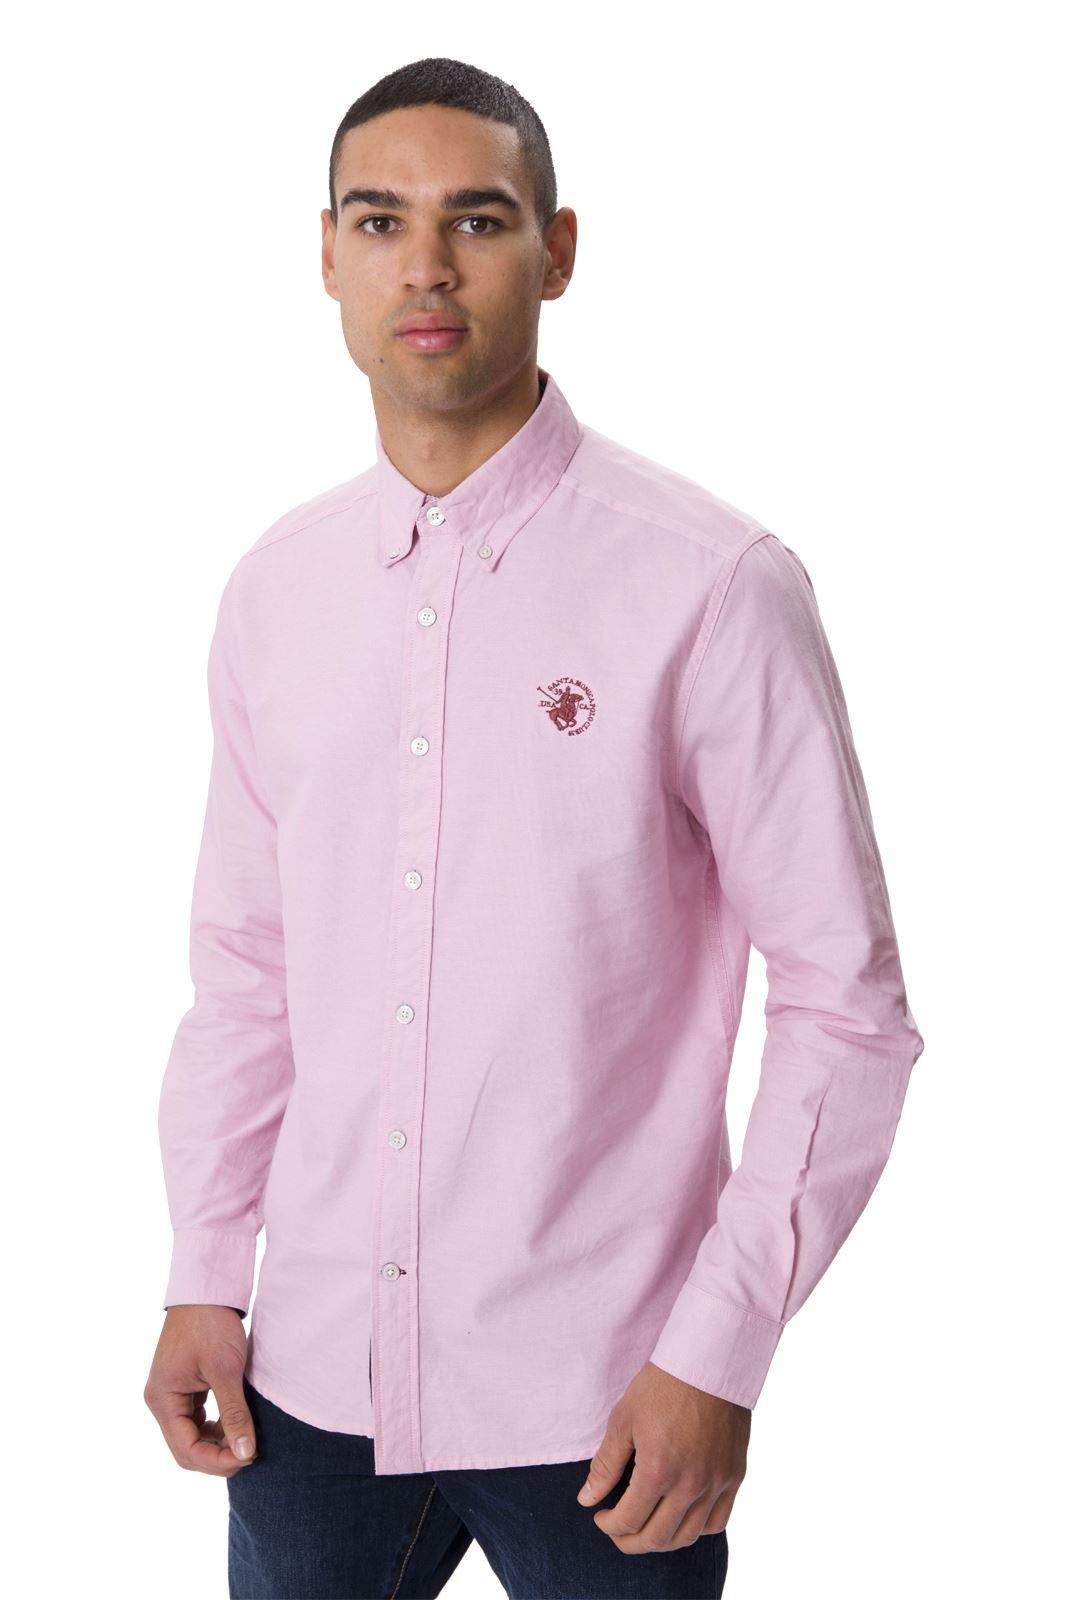 Santa monica polo club mens long sleeve plus size oxford for Plus size men shirts